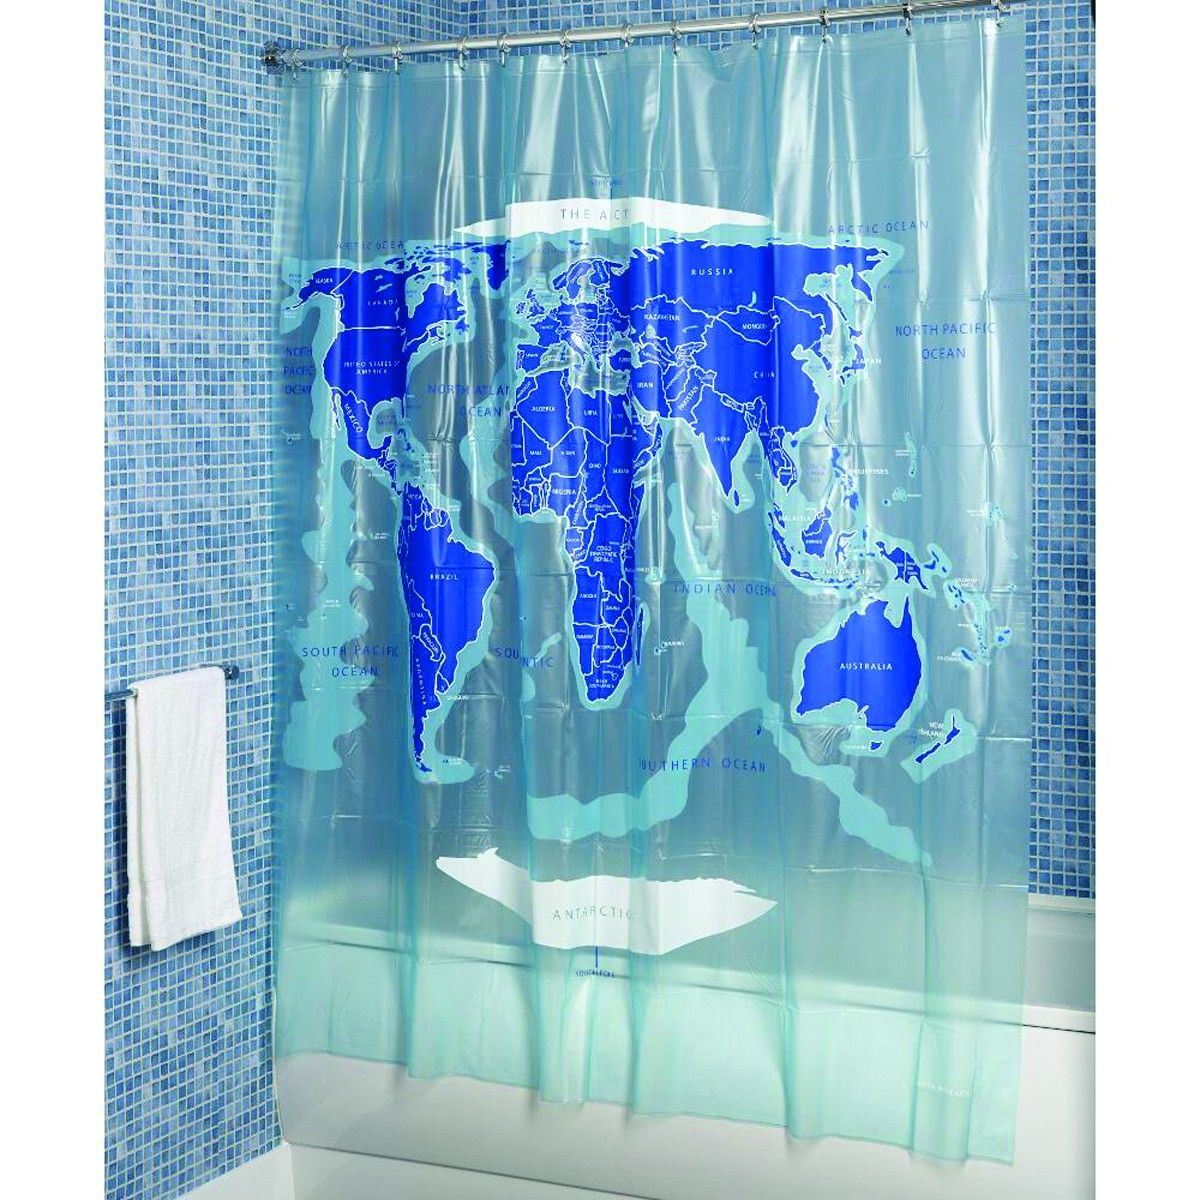 Croydex ae580815 world map shower curtain home pinterest croydex ae580815 world map shower curtain gumiabroncs Gallery